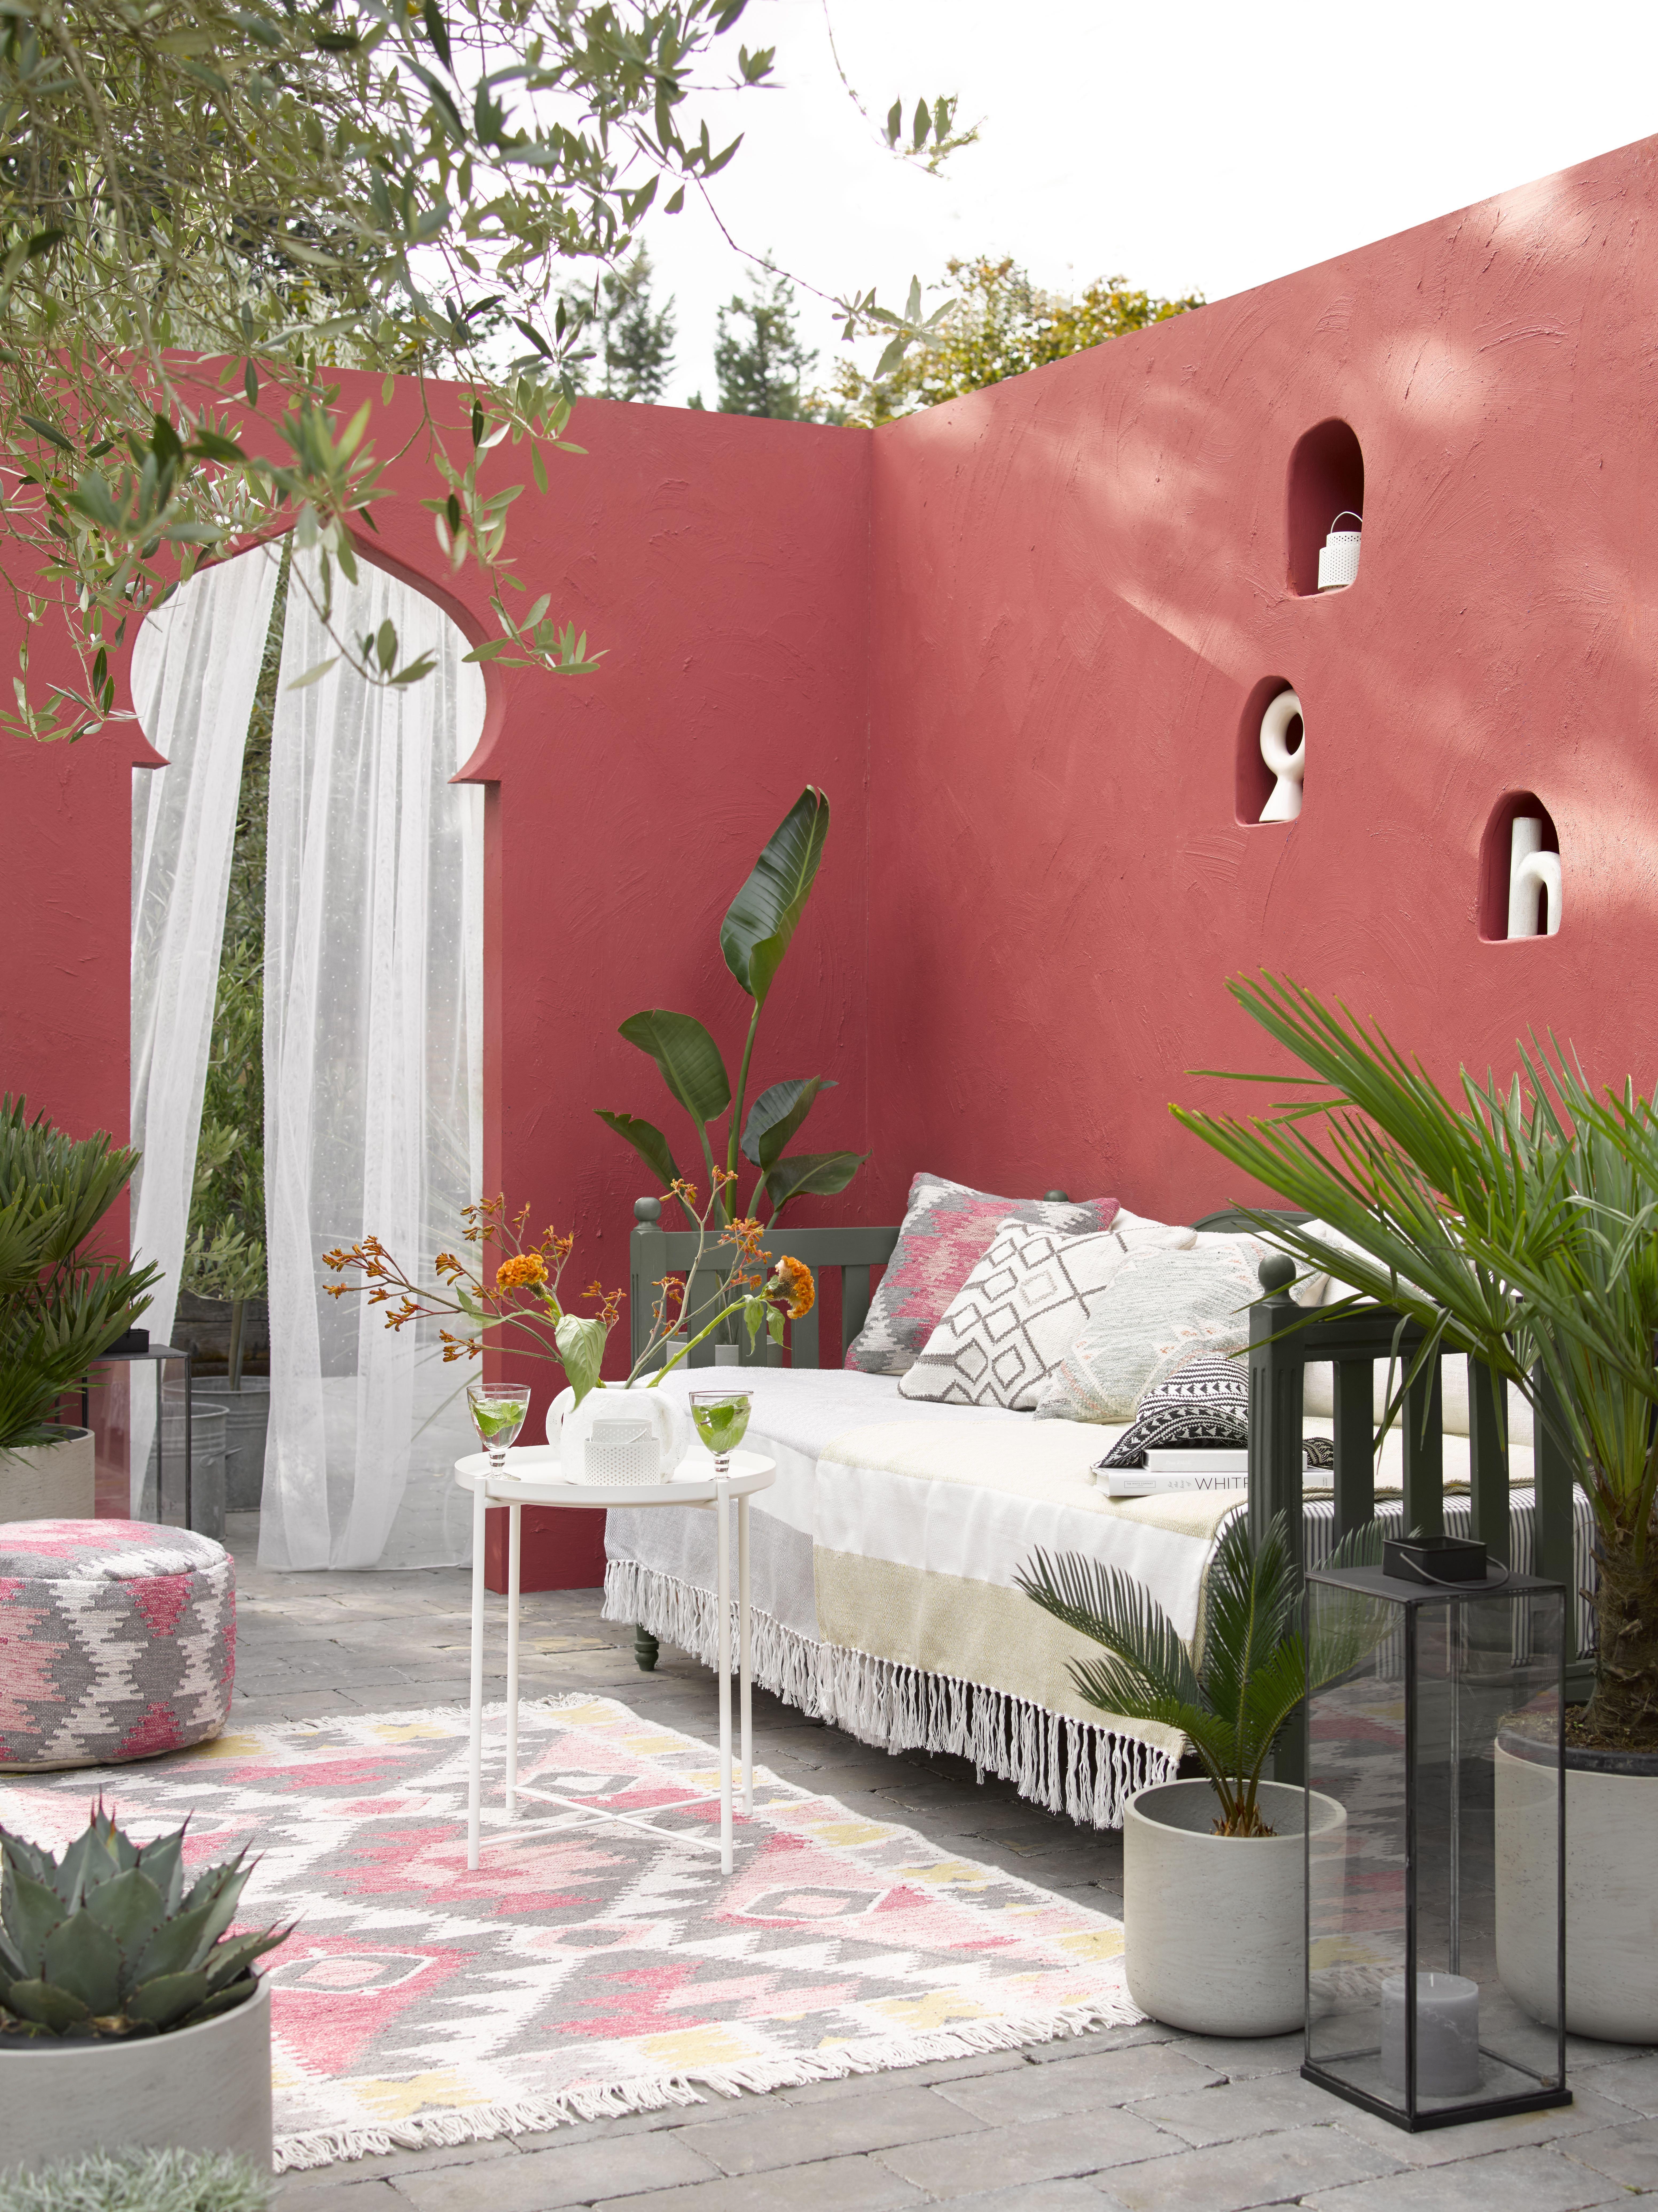 Moroc-Cushion Alt low res